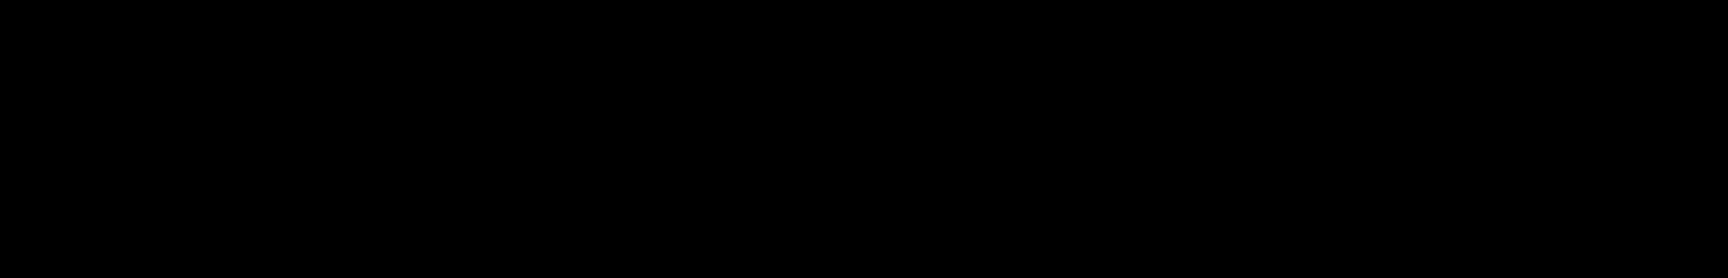 Promethean_Text_Only_Logo_Black_1728x278